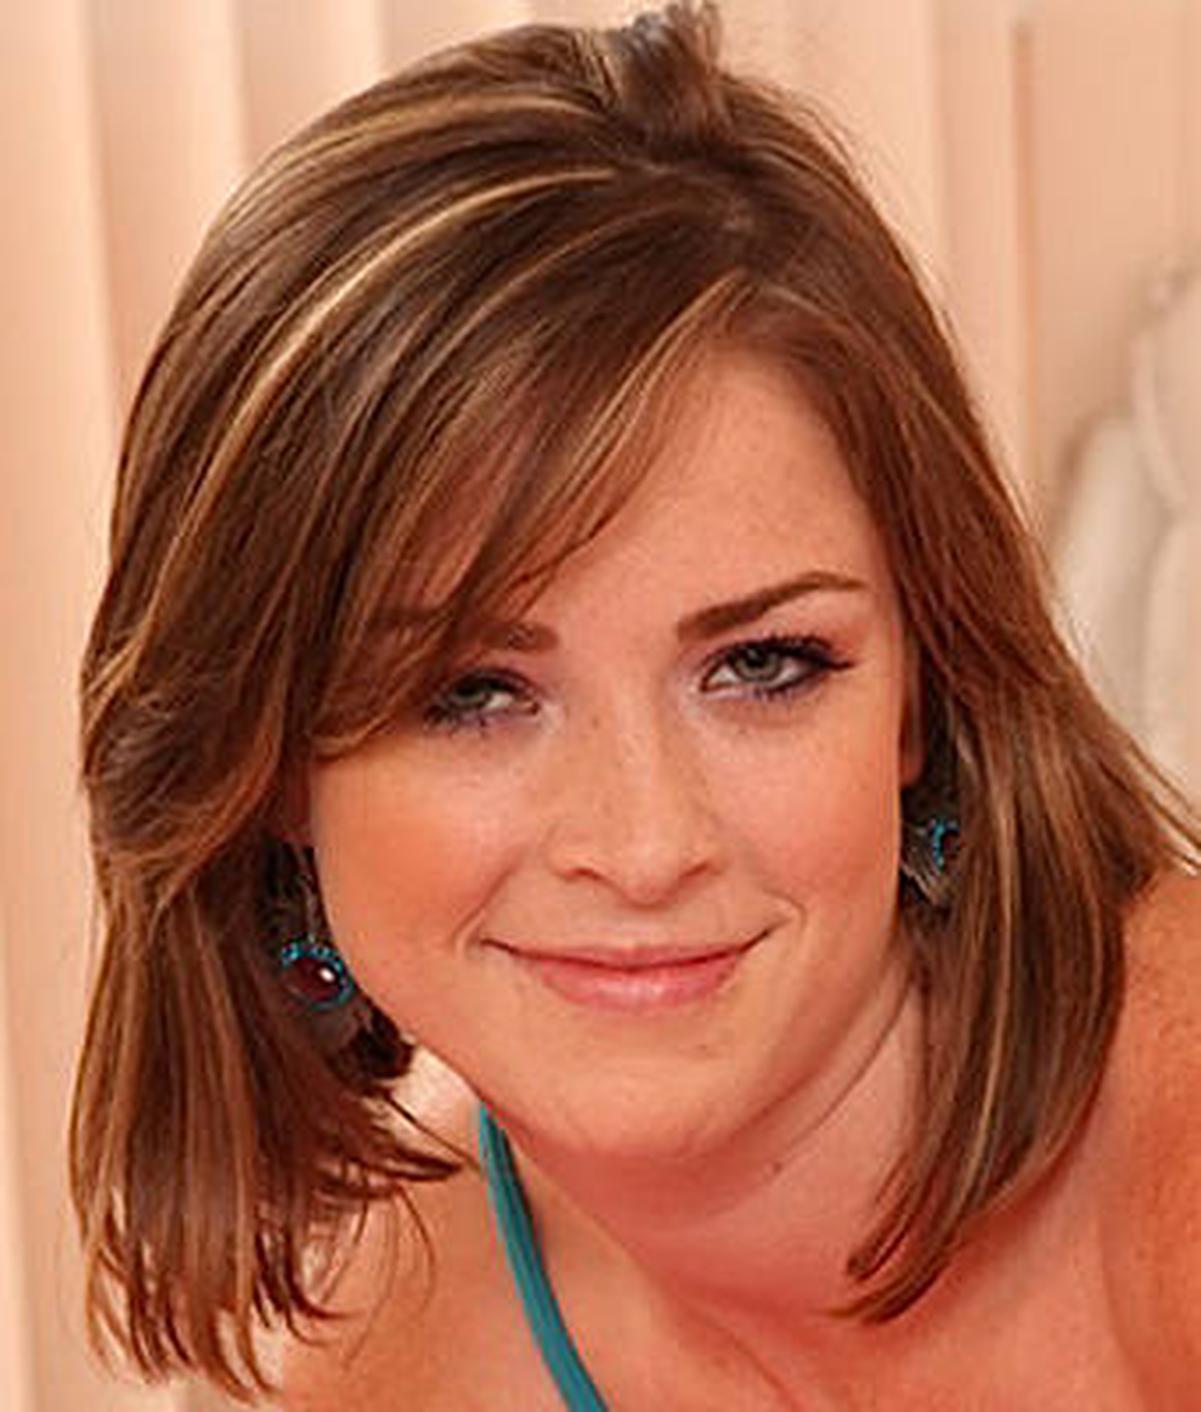 Actriz Porno Sierra Sanders sierra sanders wiki & bio - pornographic actress